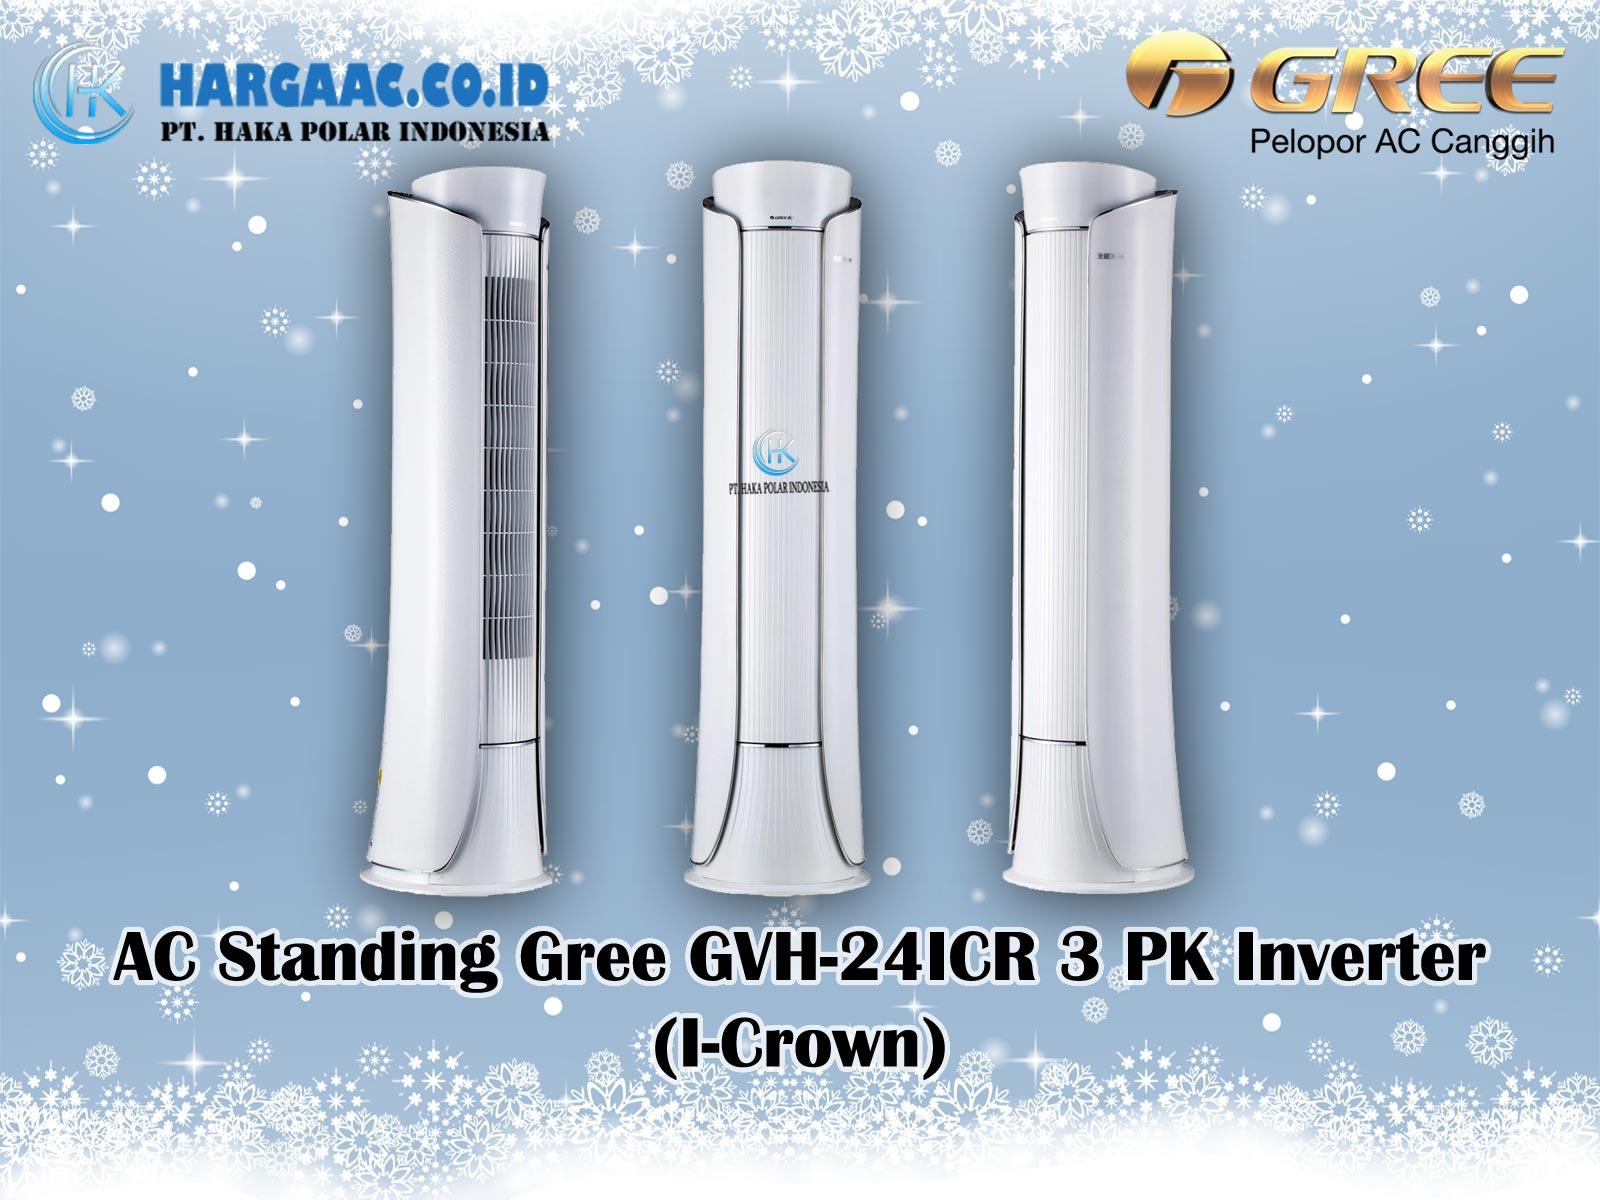 Harga Jual AC Standing Gree GVH-24ICR 3 PK Inverter (I-Crown)